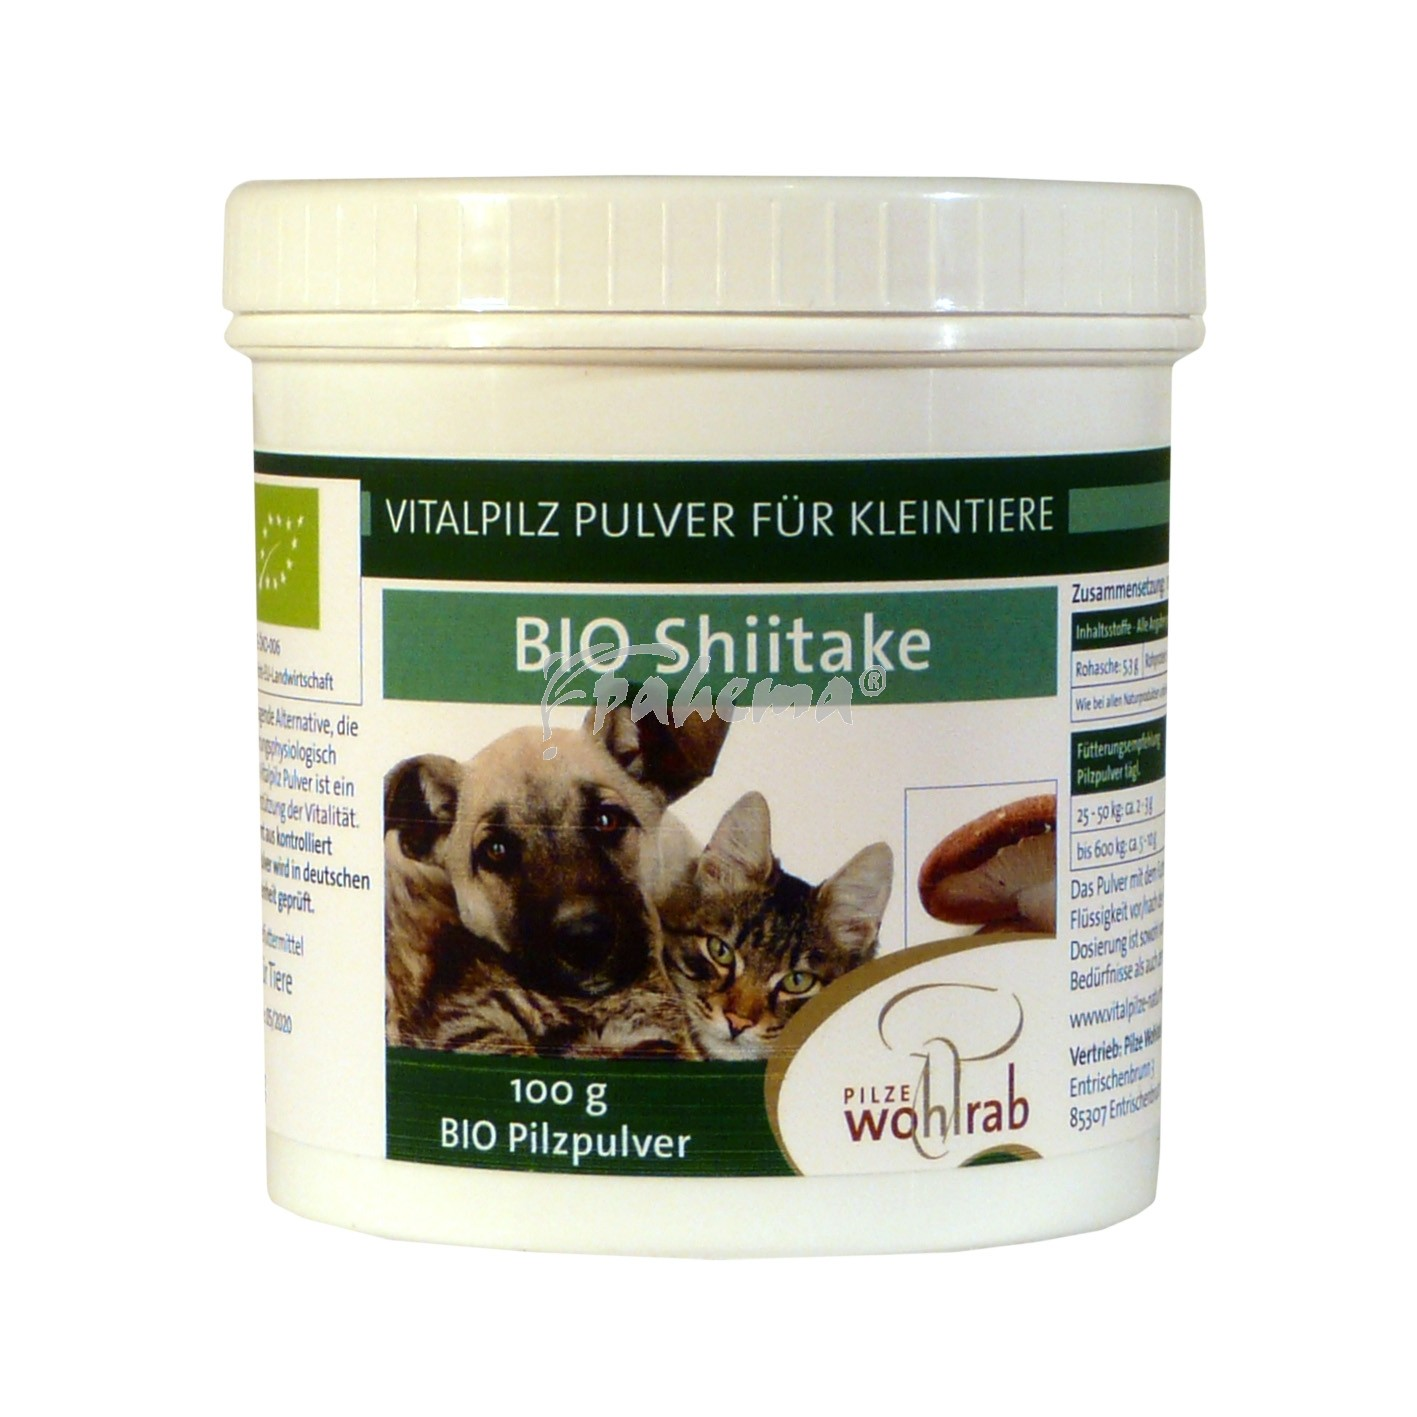 Produktbild: Shiitake Bio Pilzpulver